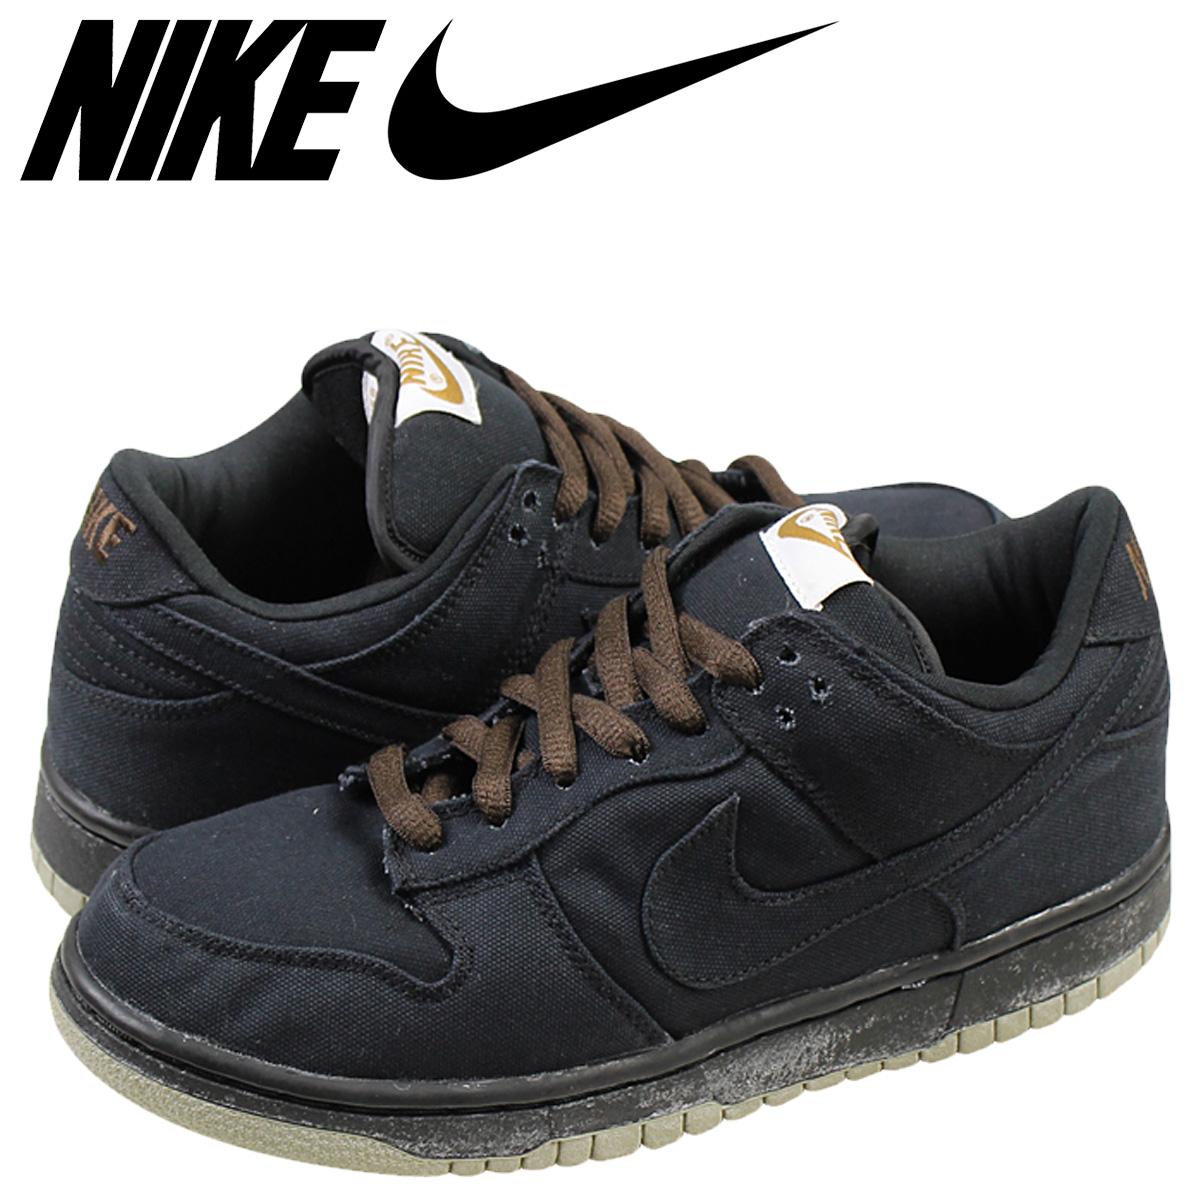 cc7aed0b4c63 Nike NIKE dunk SB sneakers DUNK LOW PRO SB CARHARTT COBALT dunk low Pro  Carhartt gold rail 304292-004 black mens